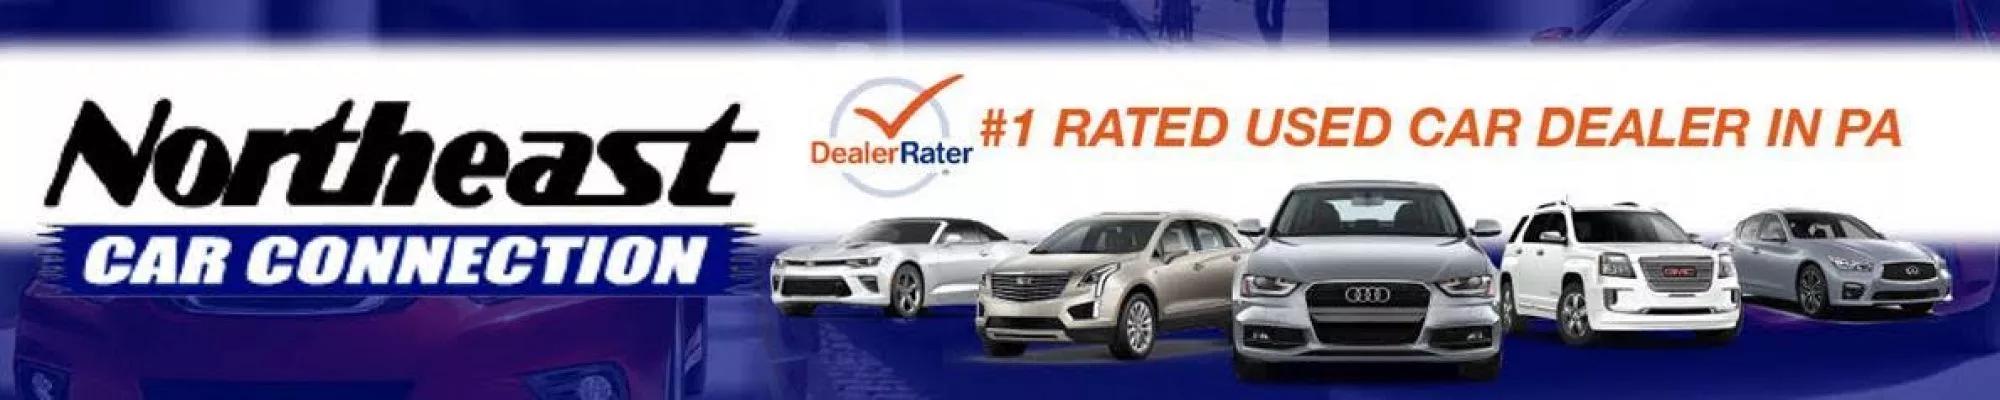 Northeast Car Connection Dealer In Northeast